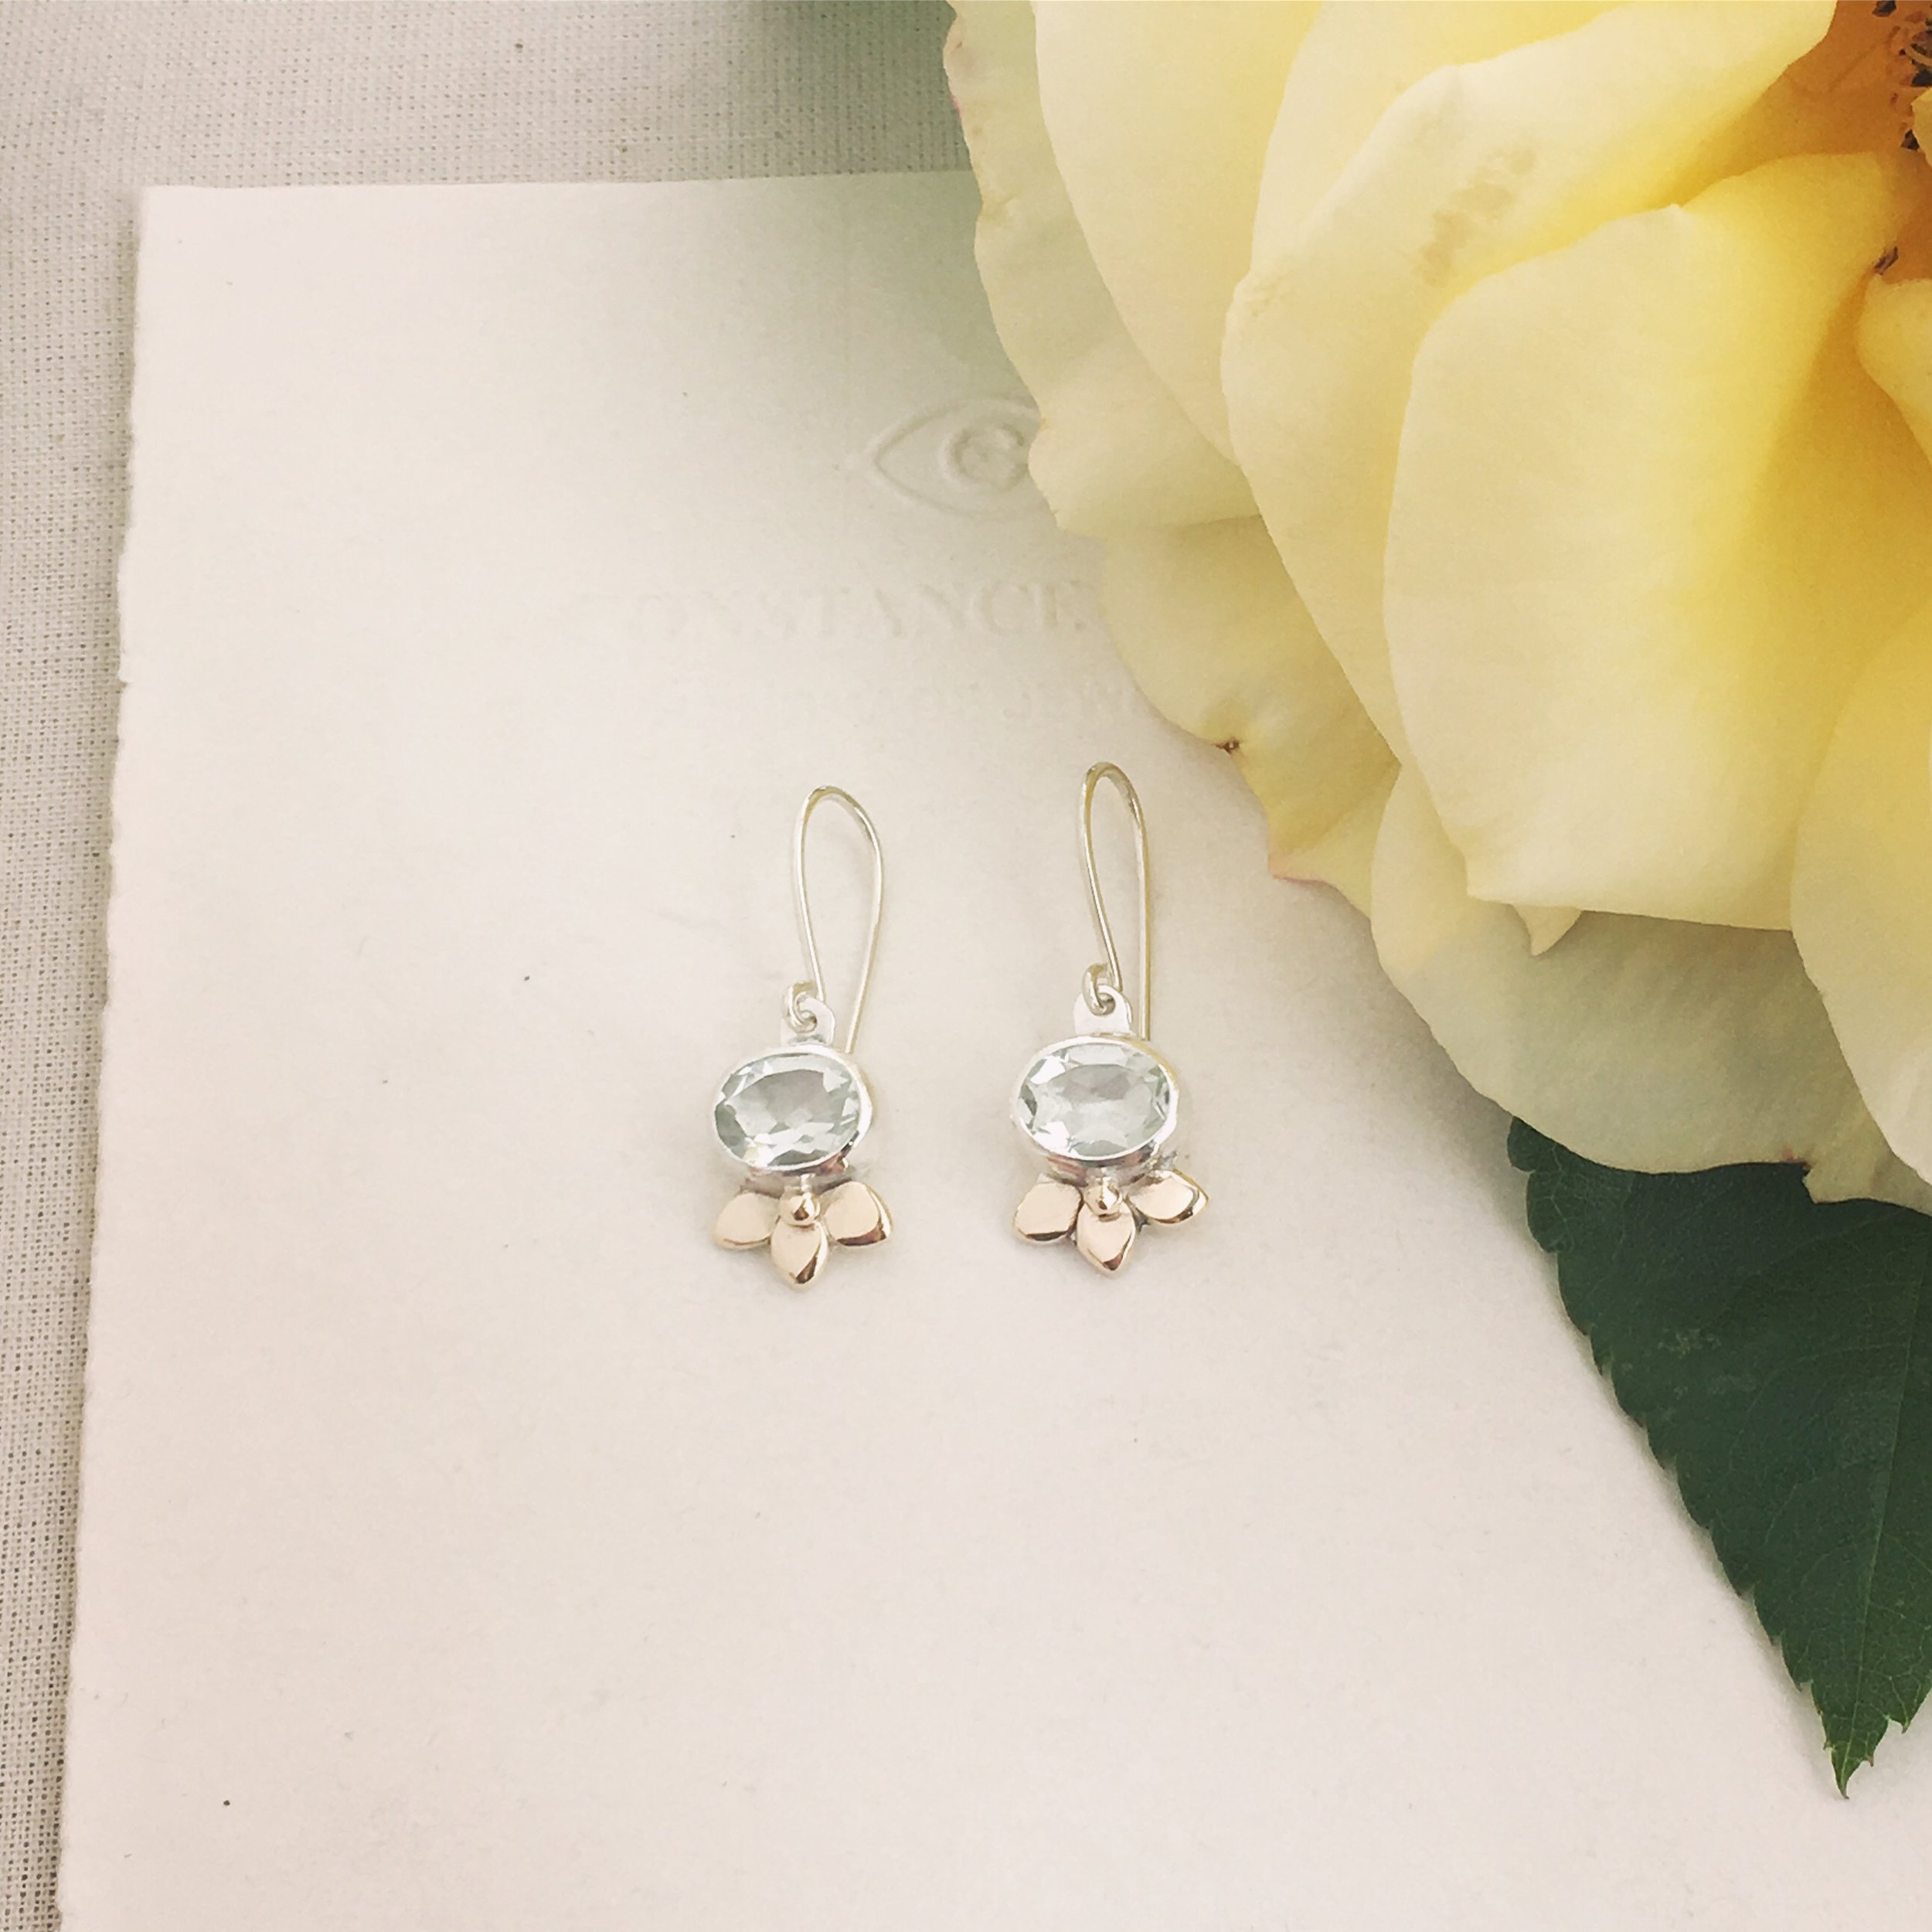 constance isobel earrings.jpeg